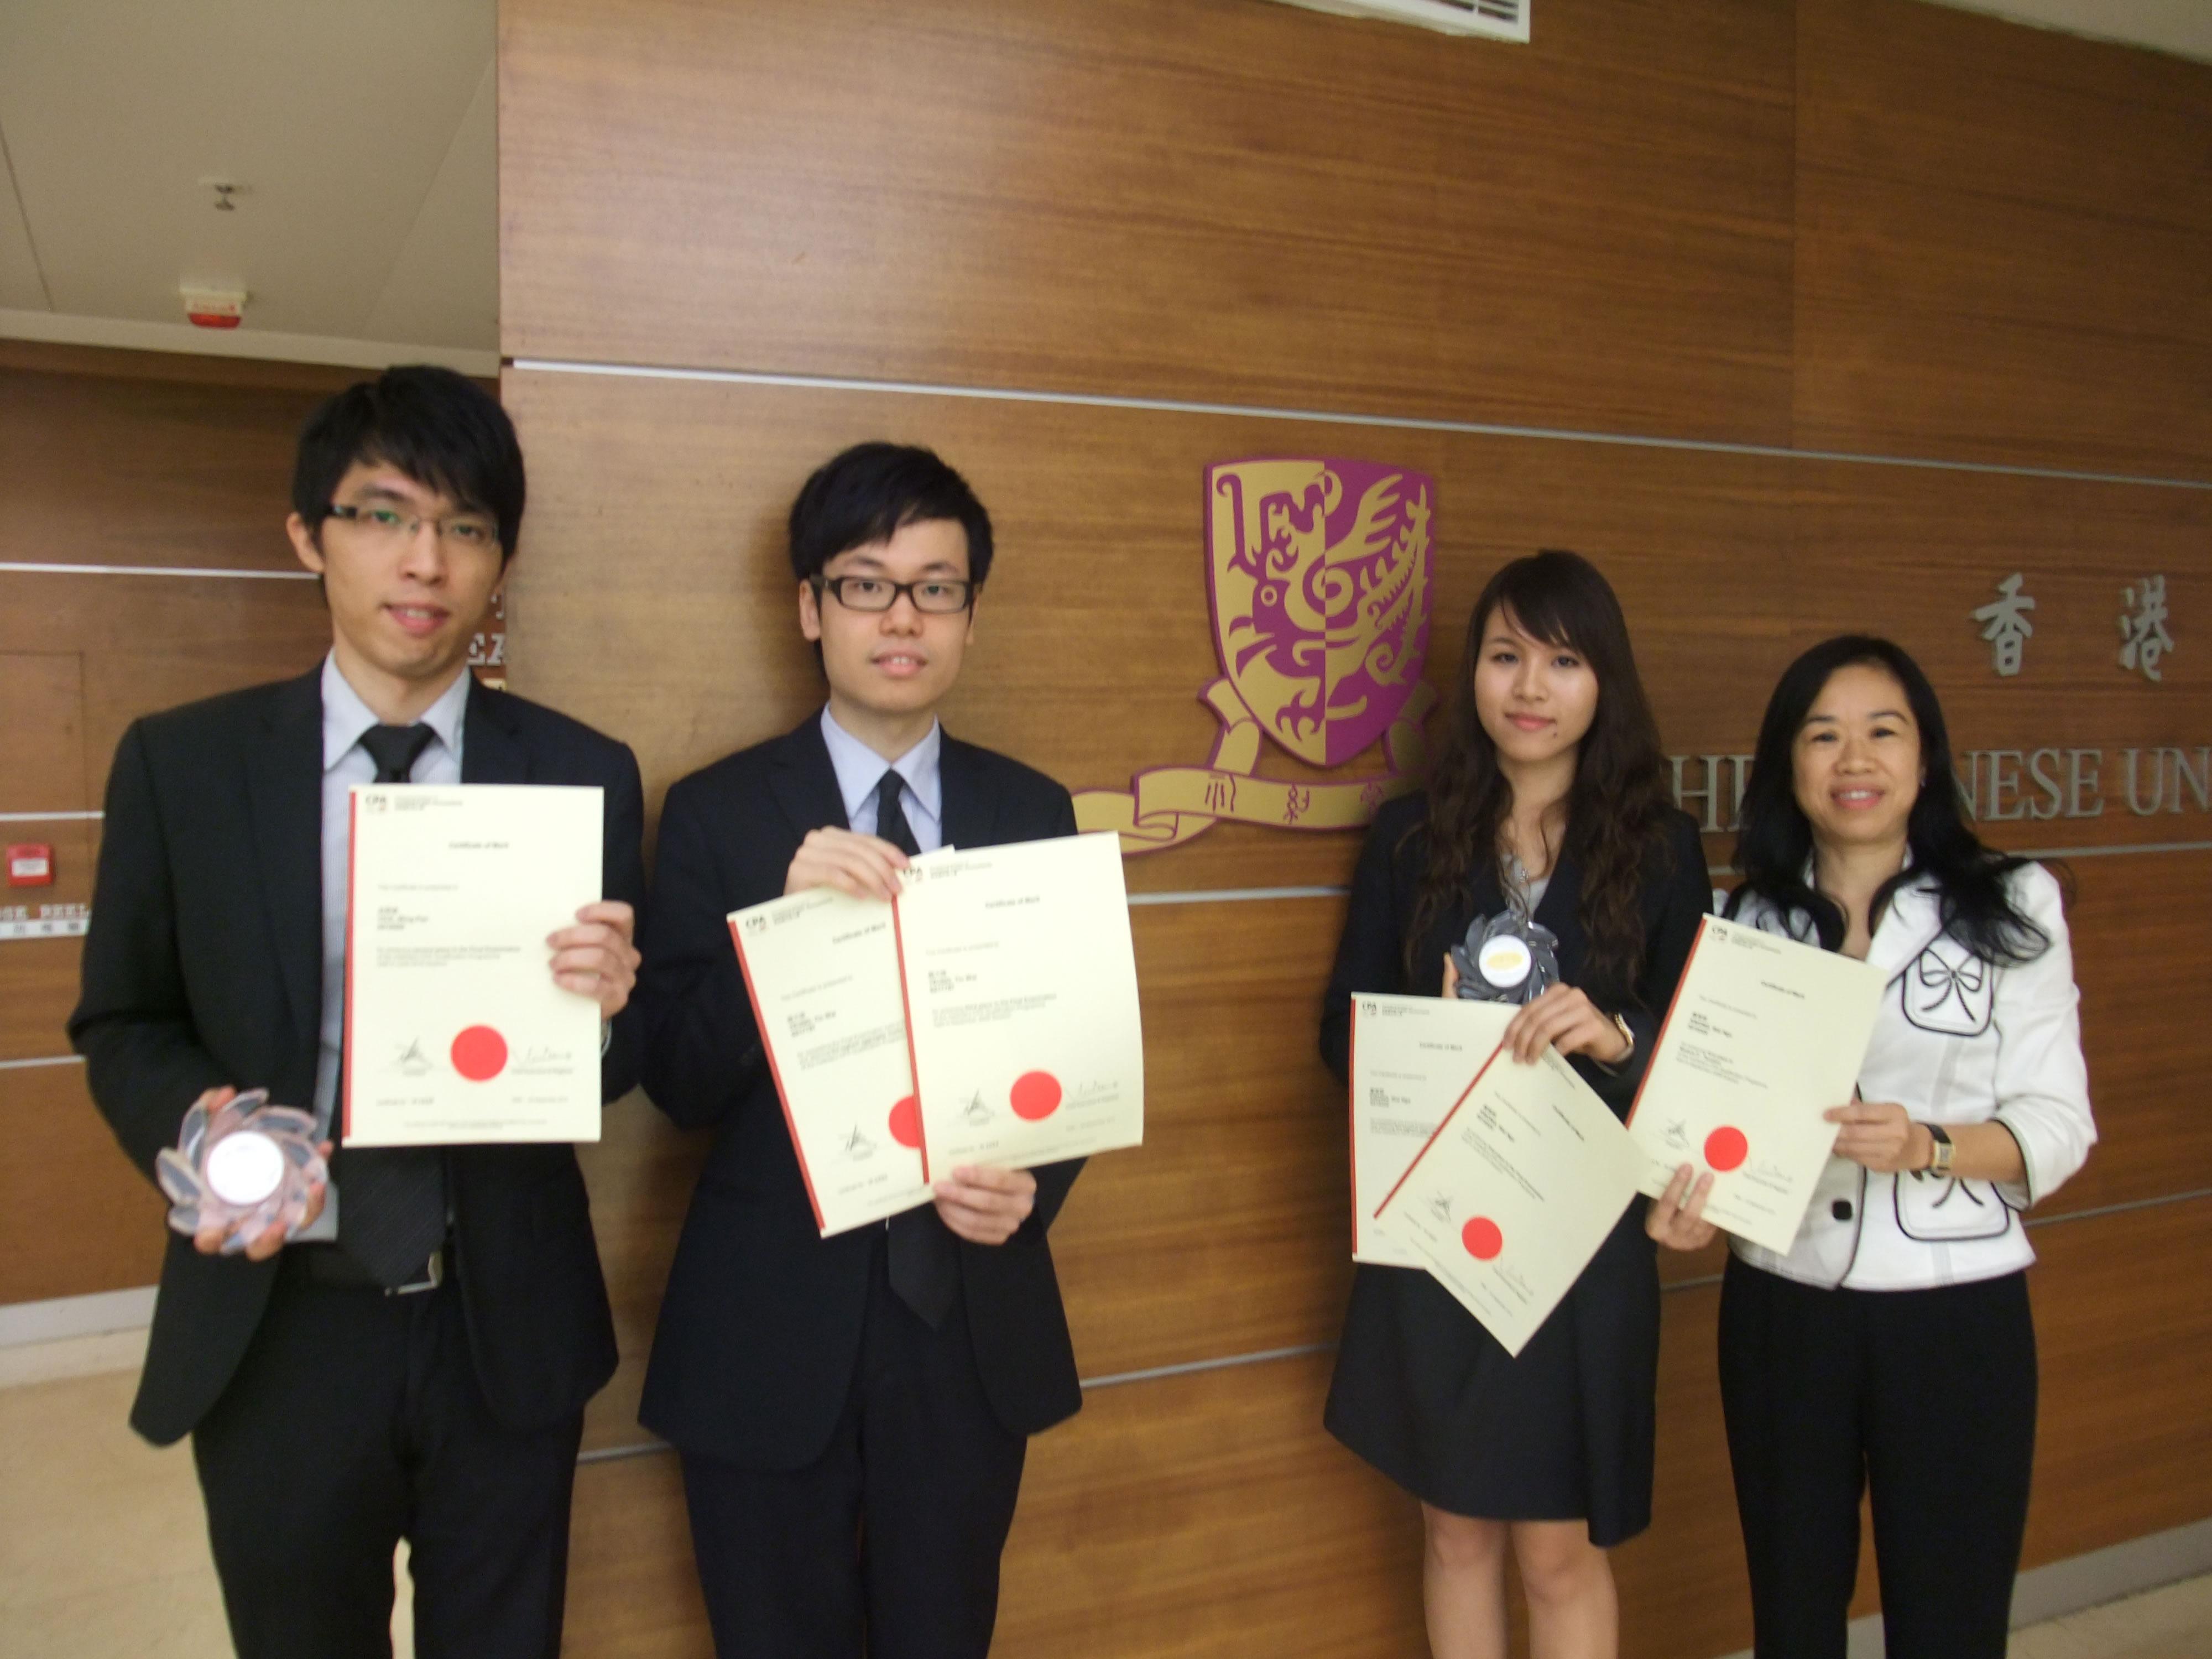 (From left) Mr. Yick Wing Pan, Mr. Yeung Tin Wai, Ms. Kwong Wai Nga and Dr. Shirley Kan, PAC Associate Program Director